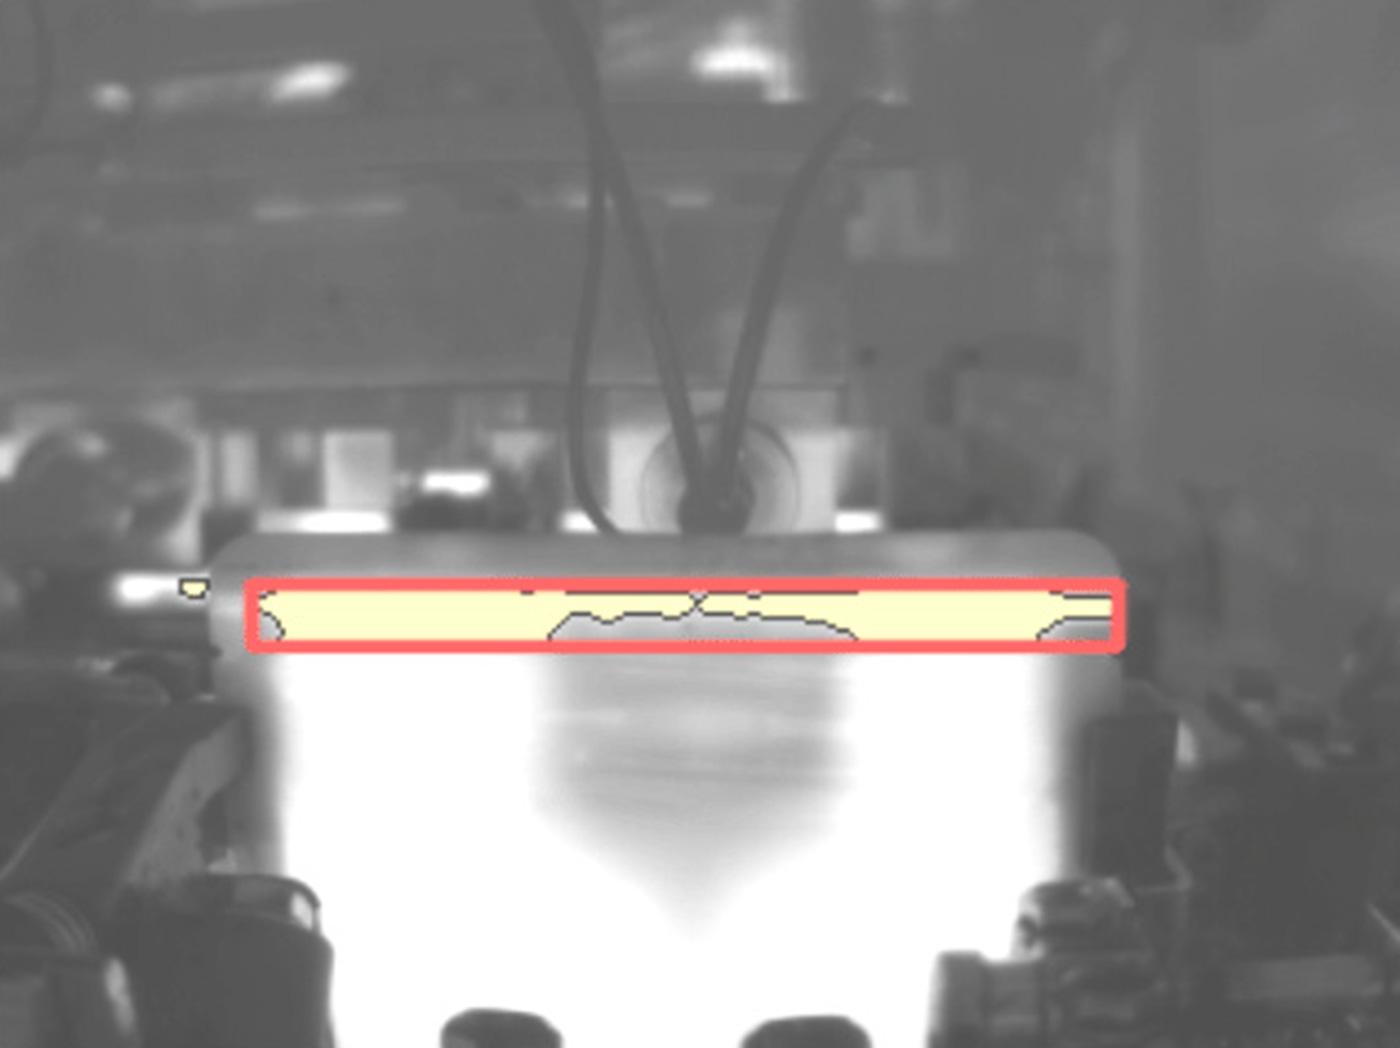 s13-verify-ultrasonic-heat-seals2.jpg